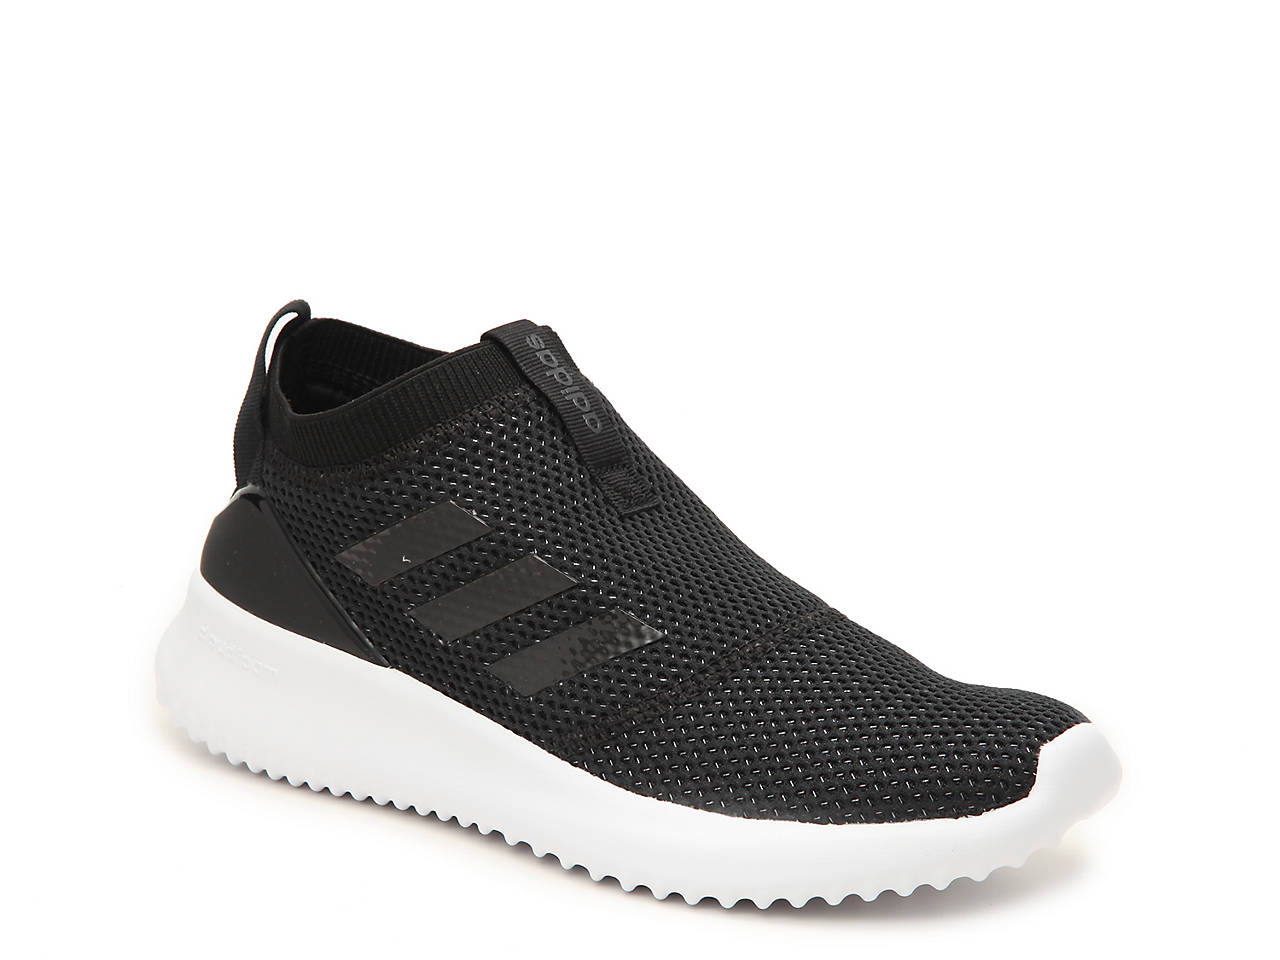 734bb7f42716 adidas Ultimafusion Slip-On Sneaker - Women s Women s Shoes